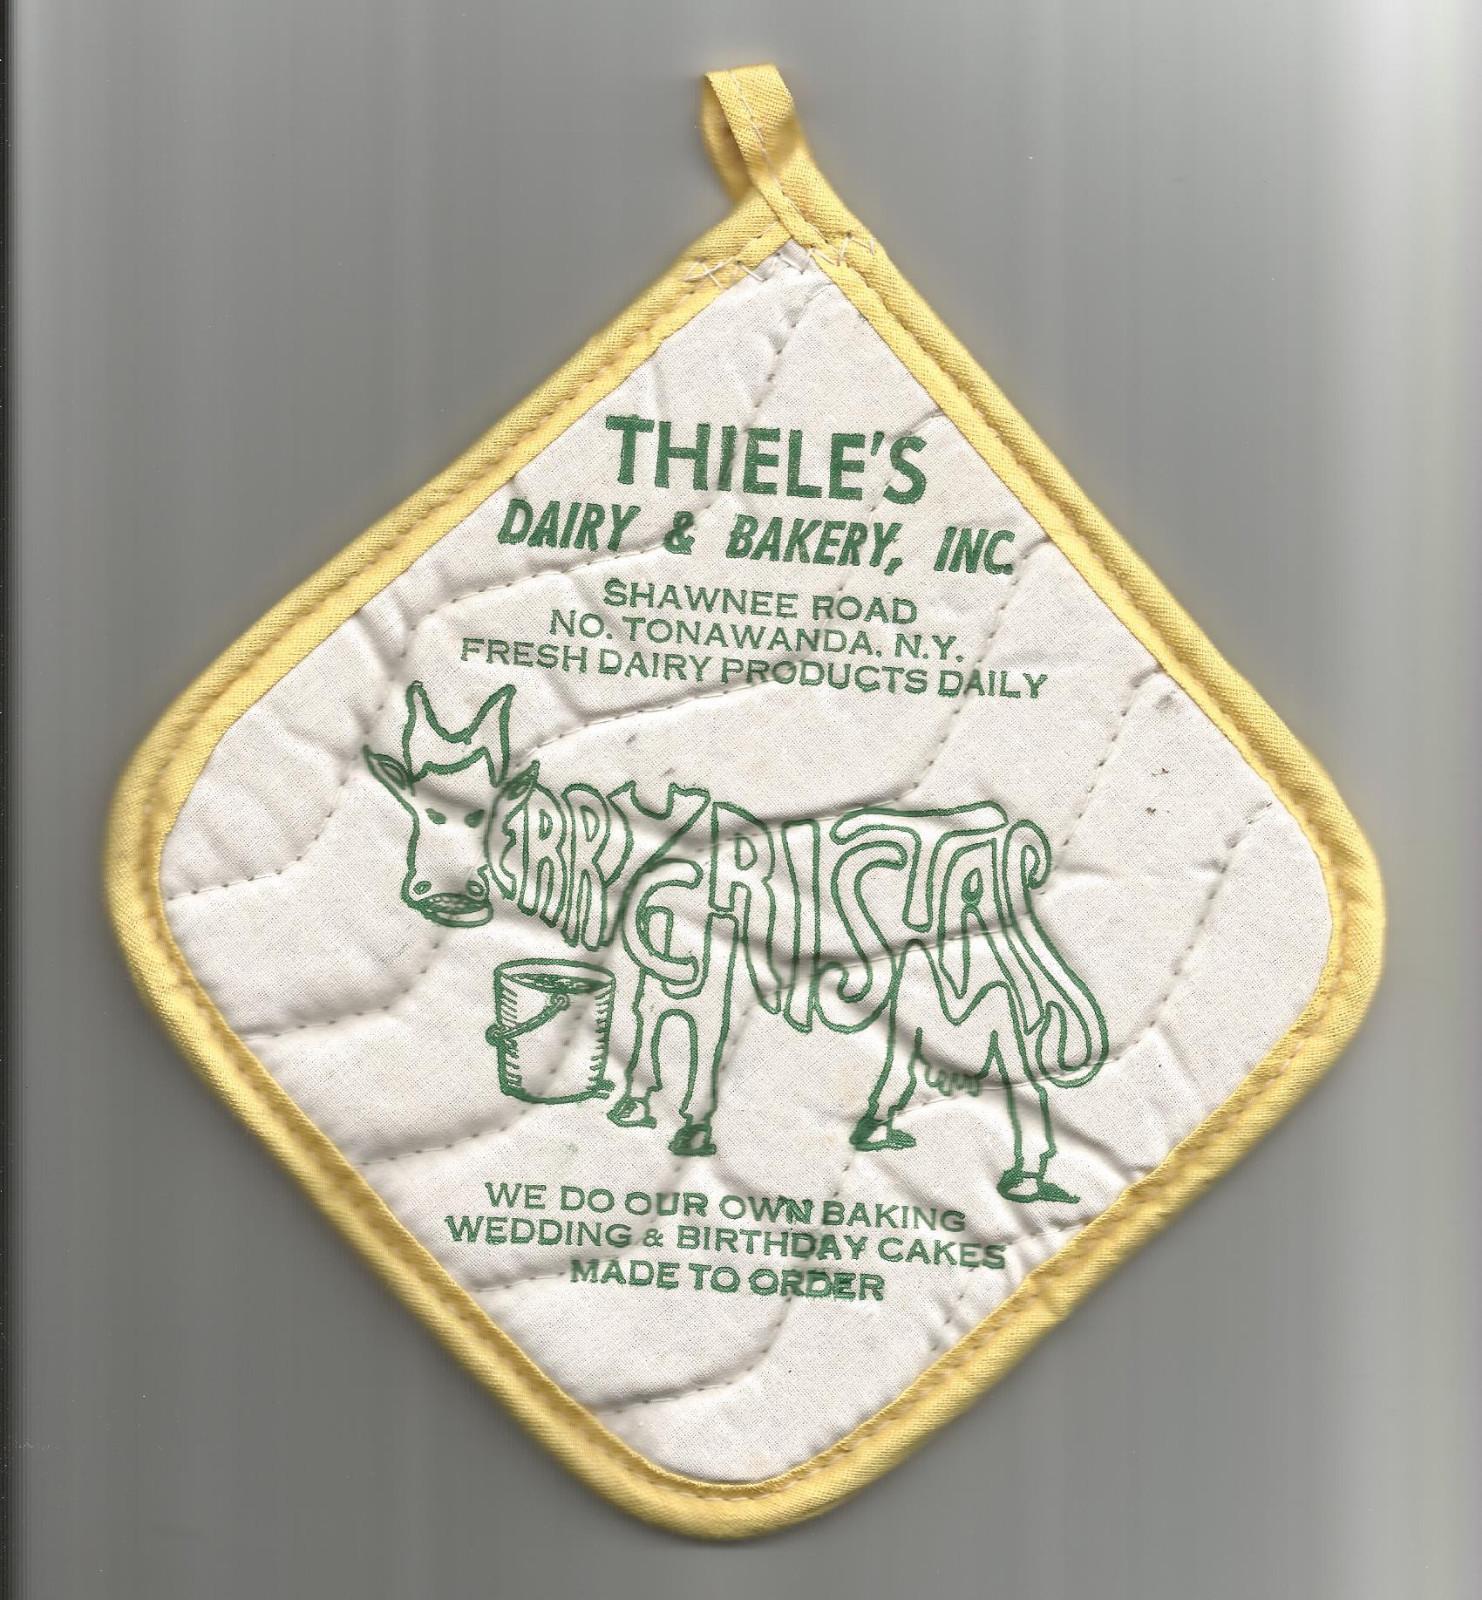 Thieles Dairy - Pot Holder.jpg